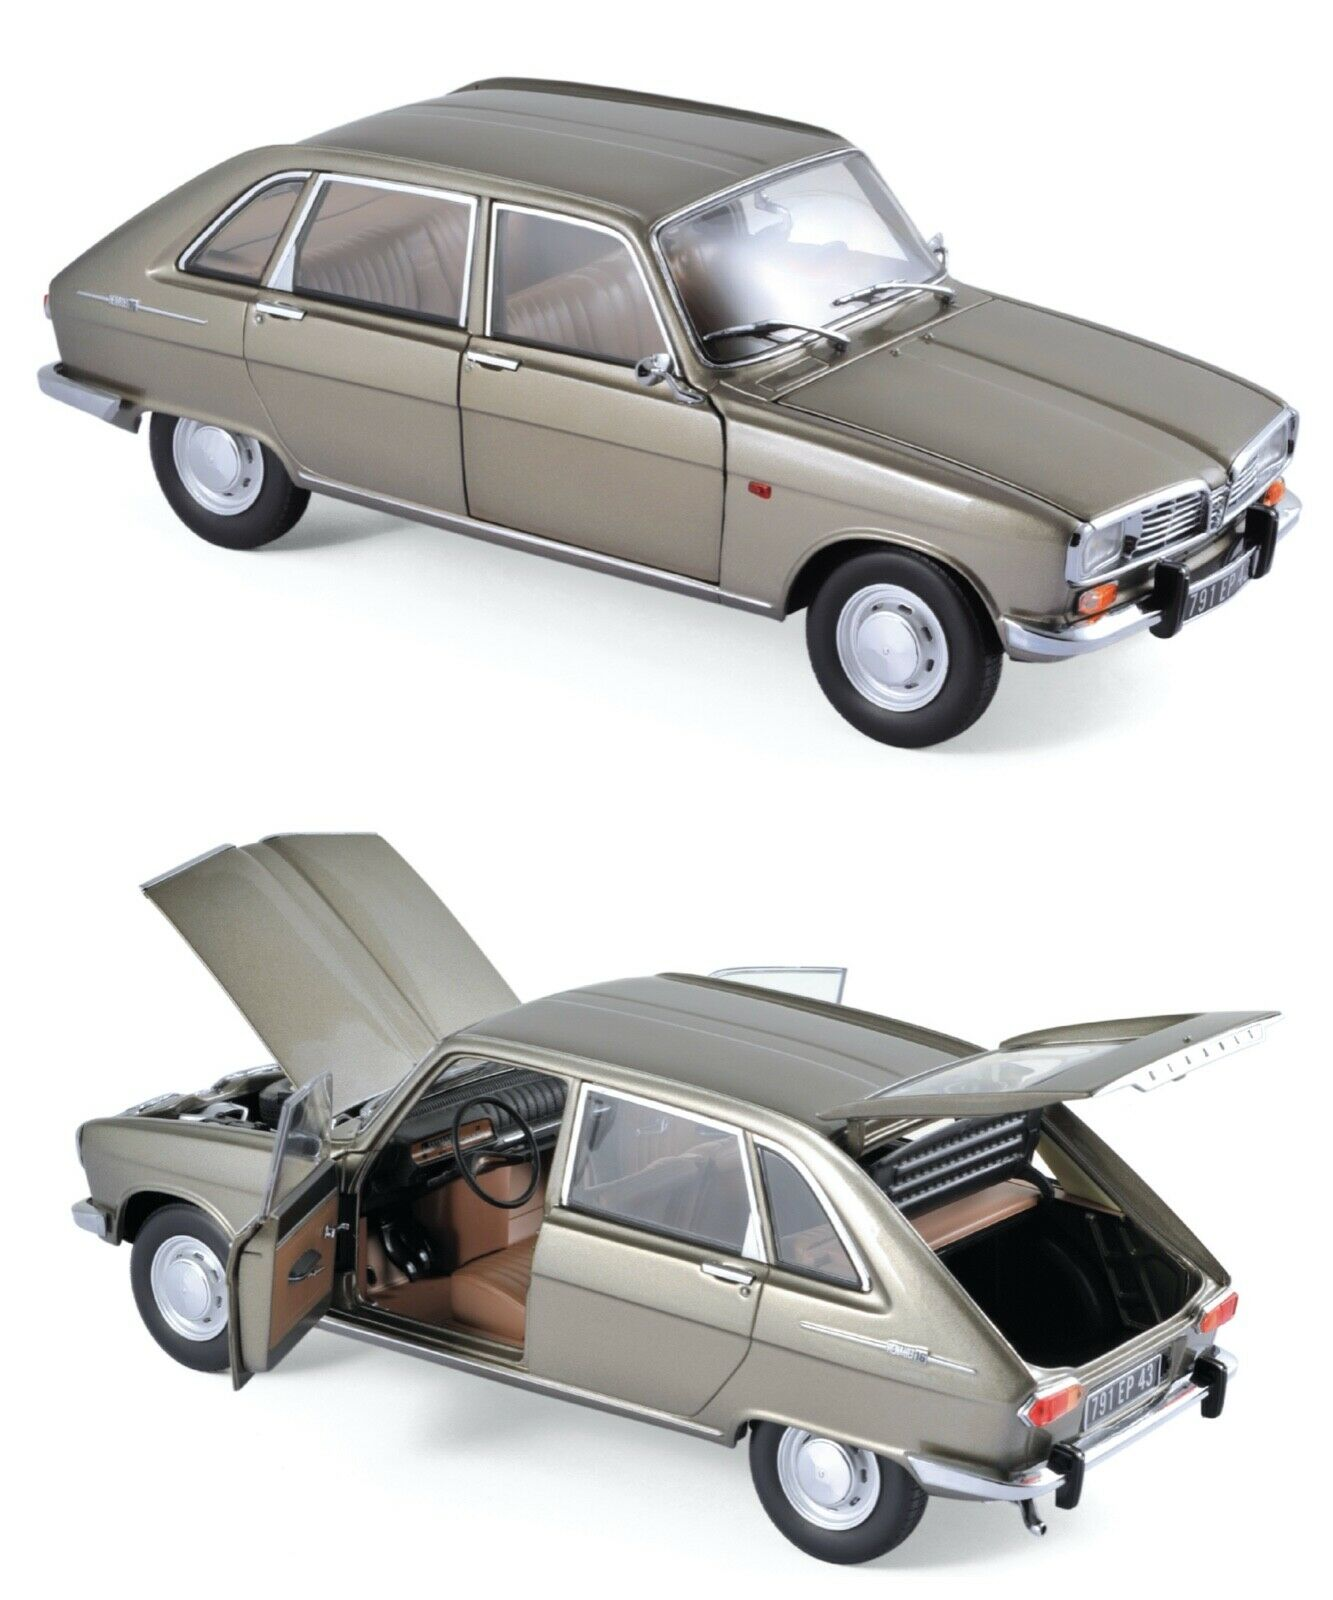 1 18 Norev Renault 16 1969 Beige Grau Metallisch Neu Schachtel